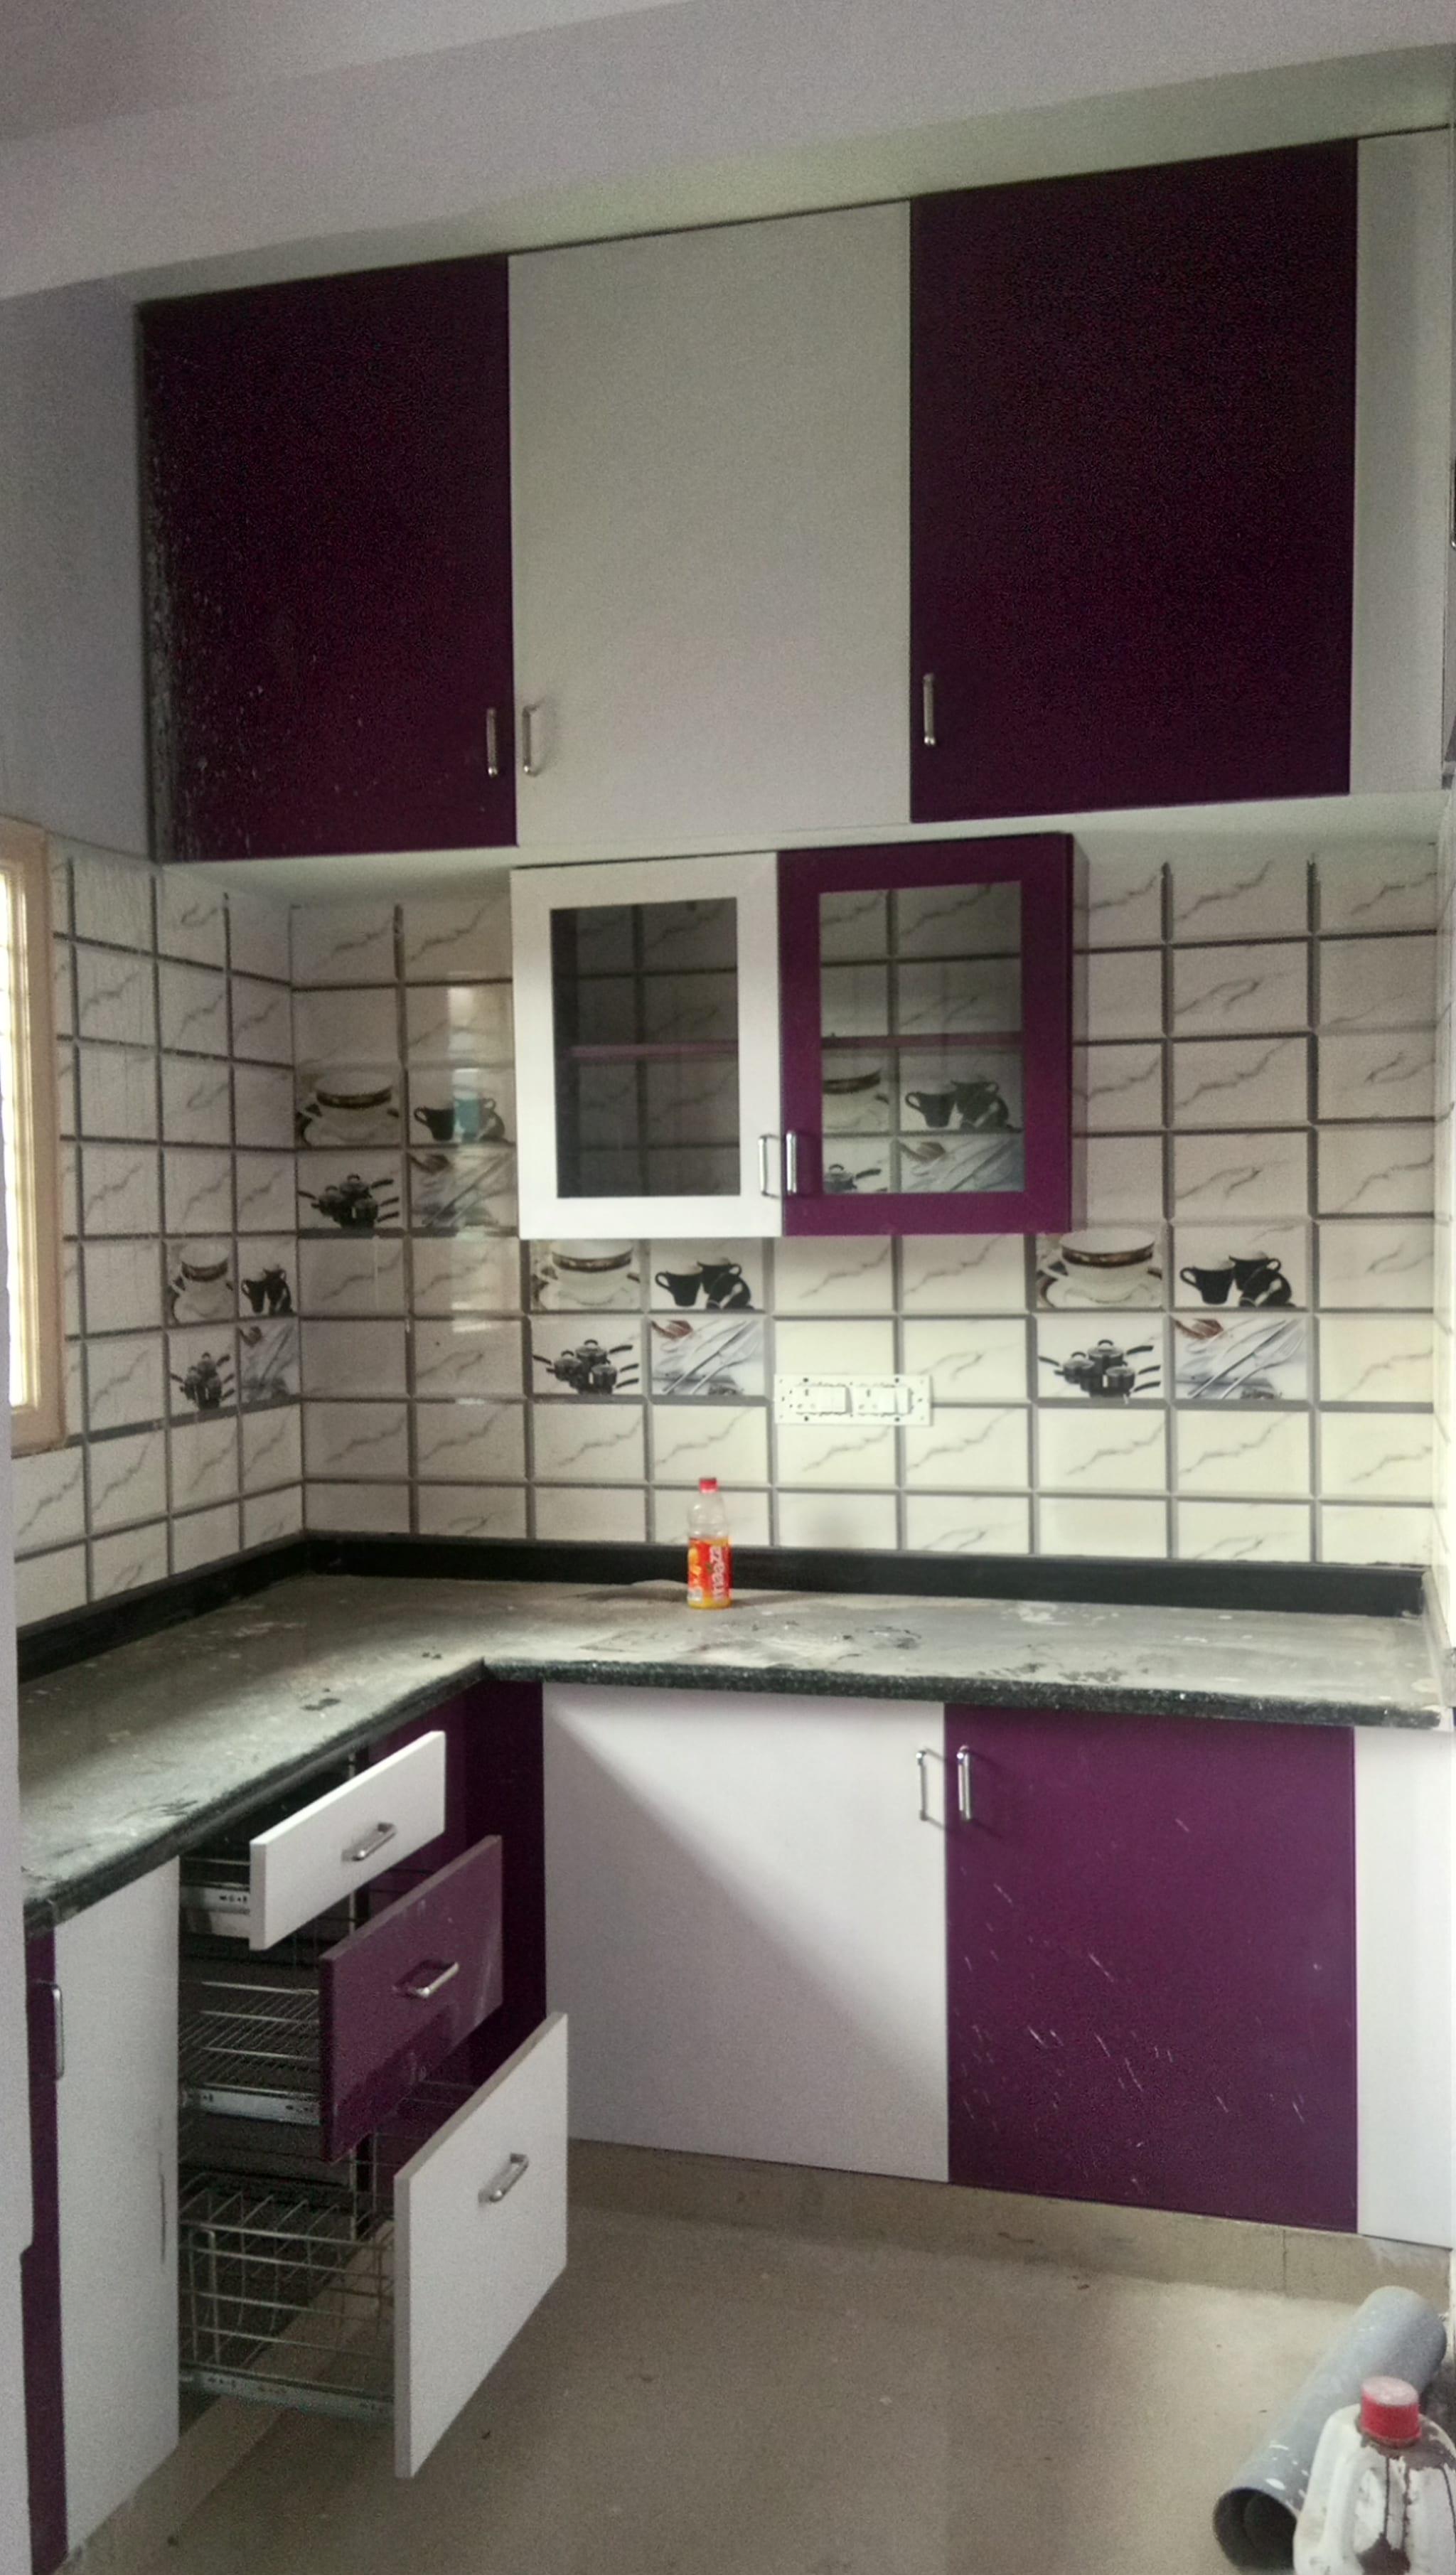 Mithra Pvc Modular Kitchen Cabinets & Interior Design, Near ...